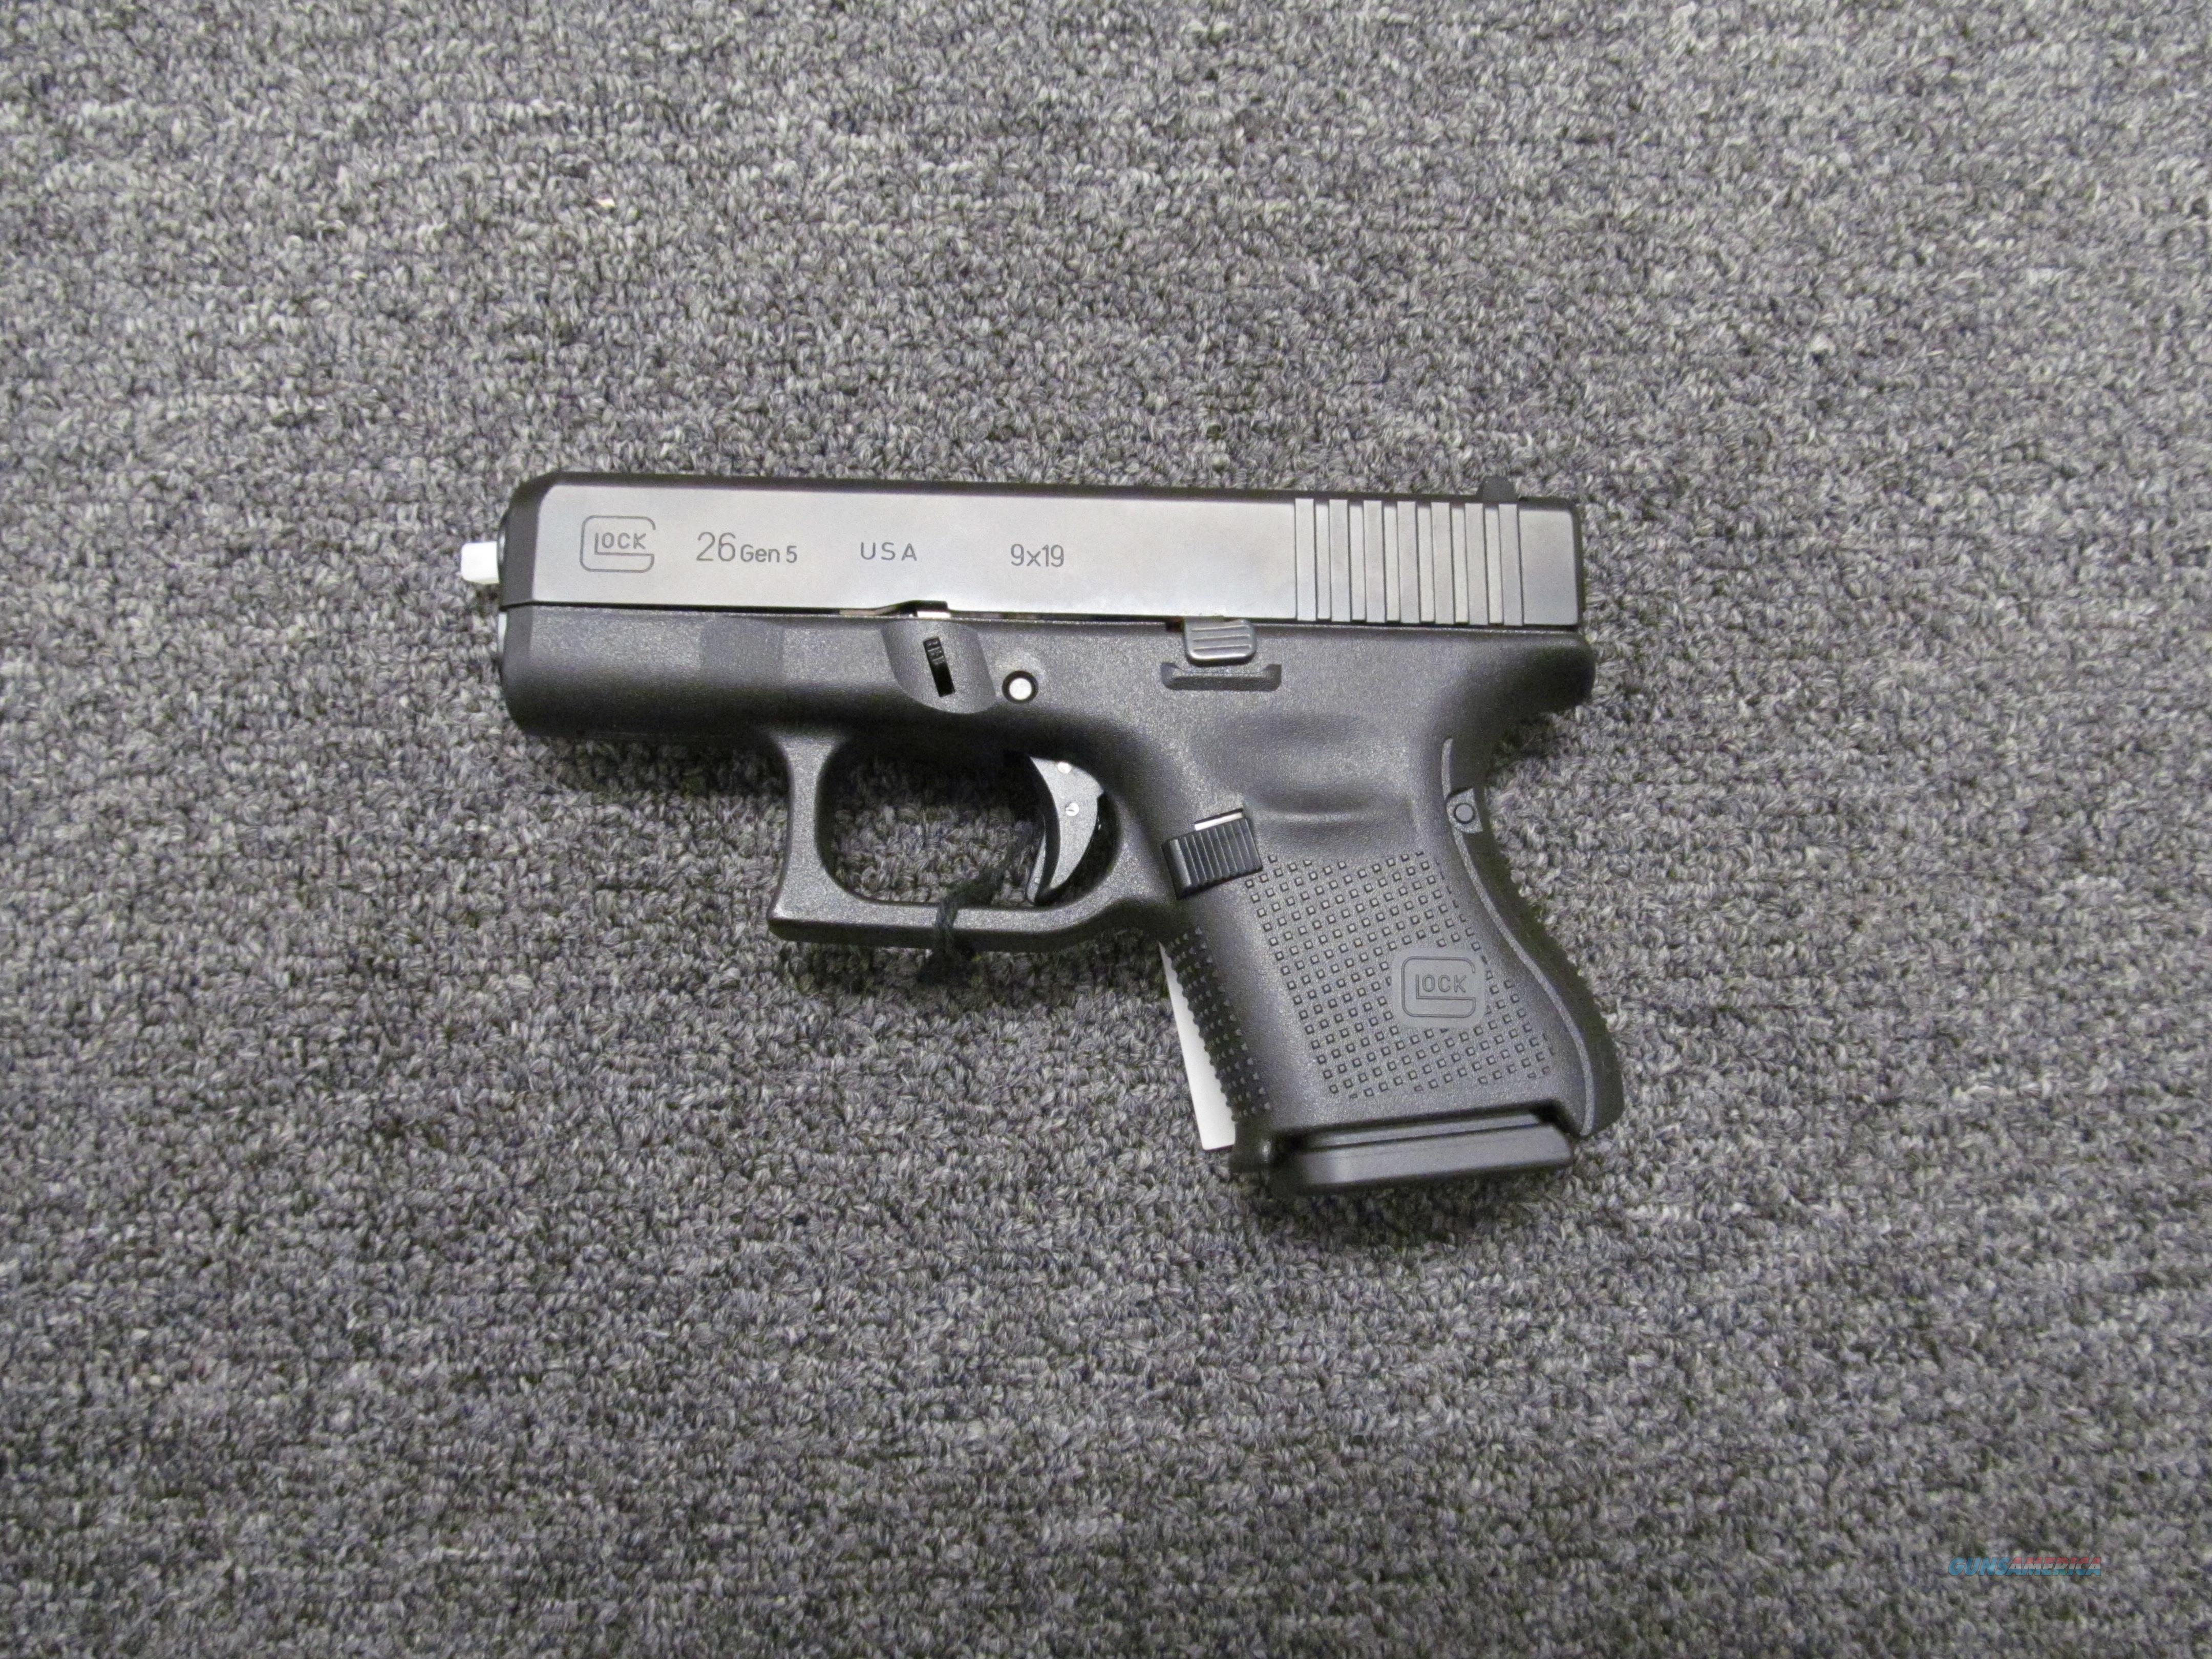 Glock 26 Gen 5 (UA2650201)  Guns > Pistols > Glock Pistols > 26/27